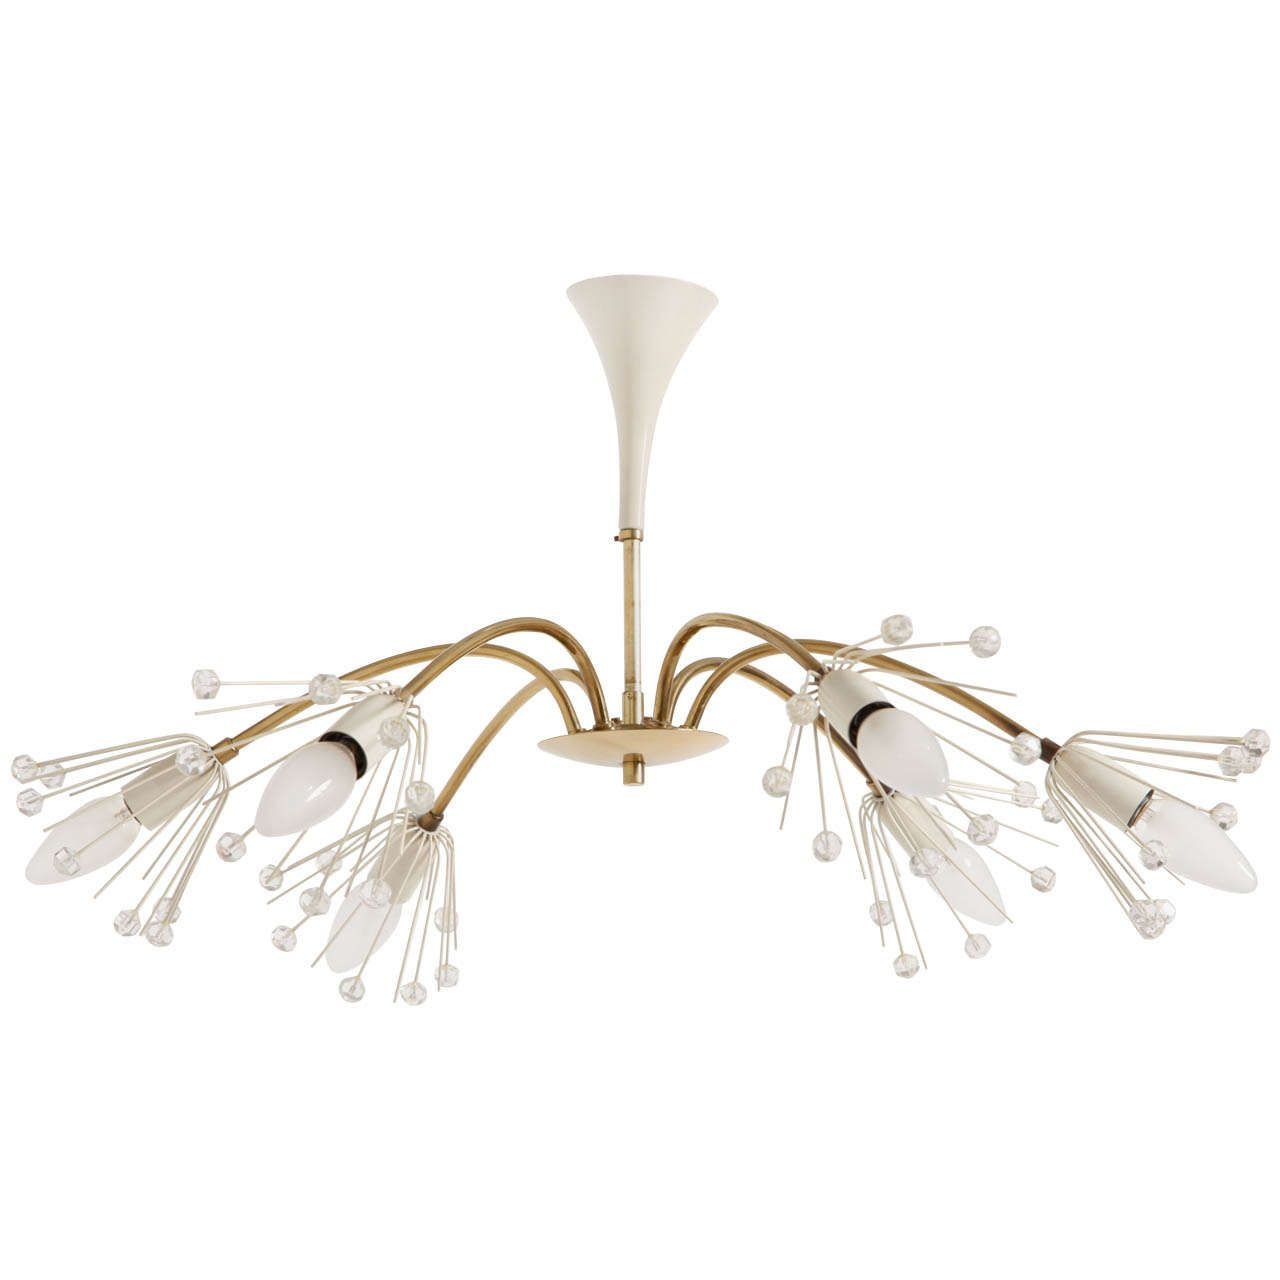 Stejnar chandelier chandeliers pendant lighting and modern